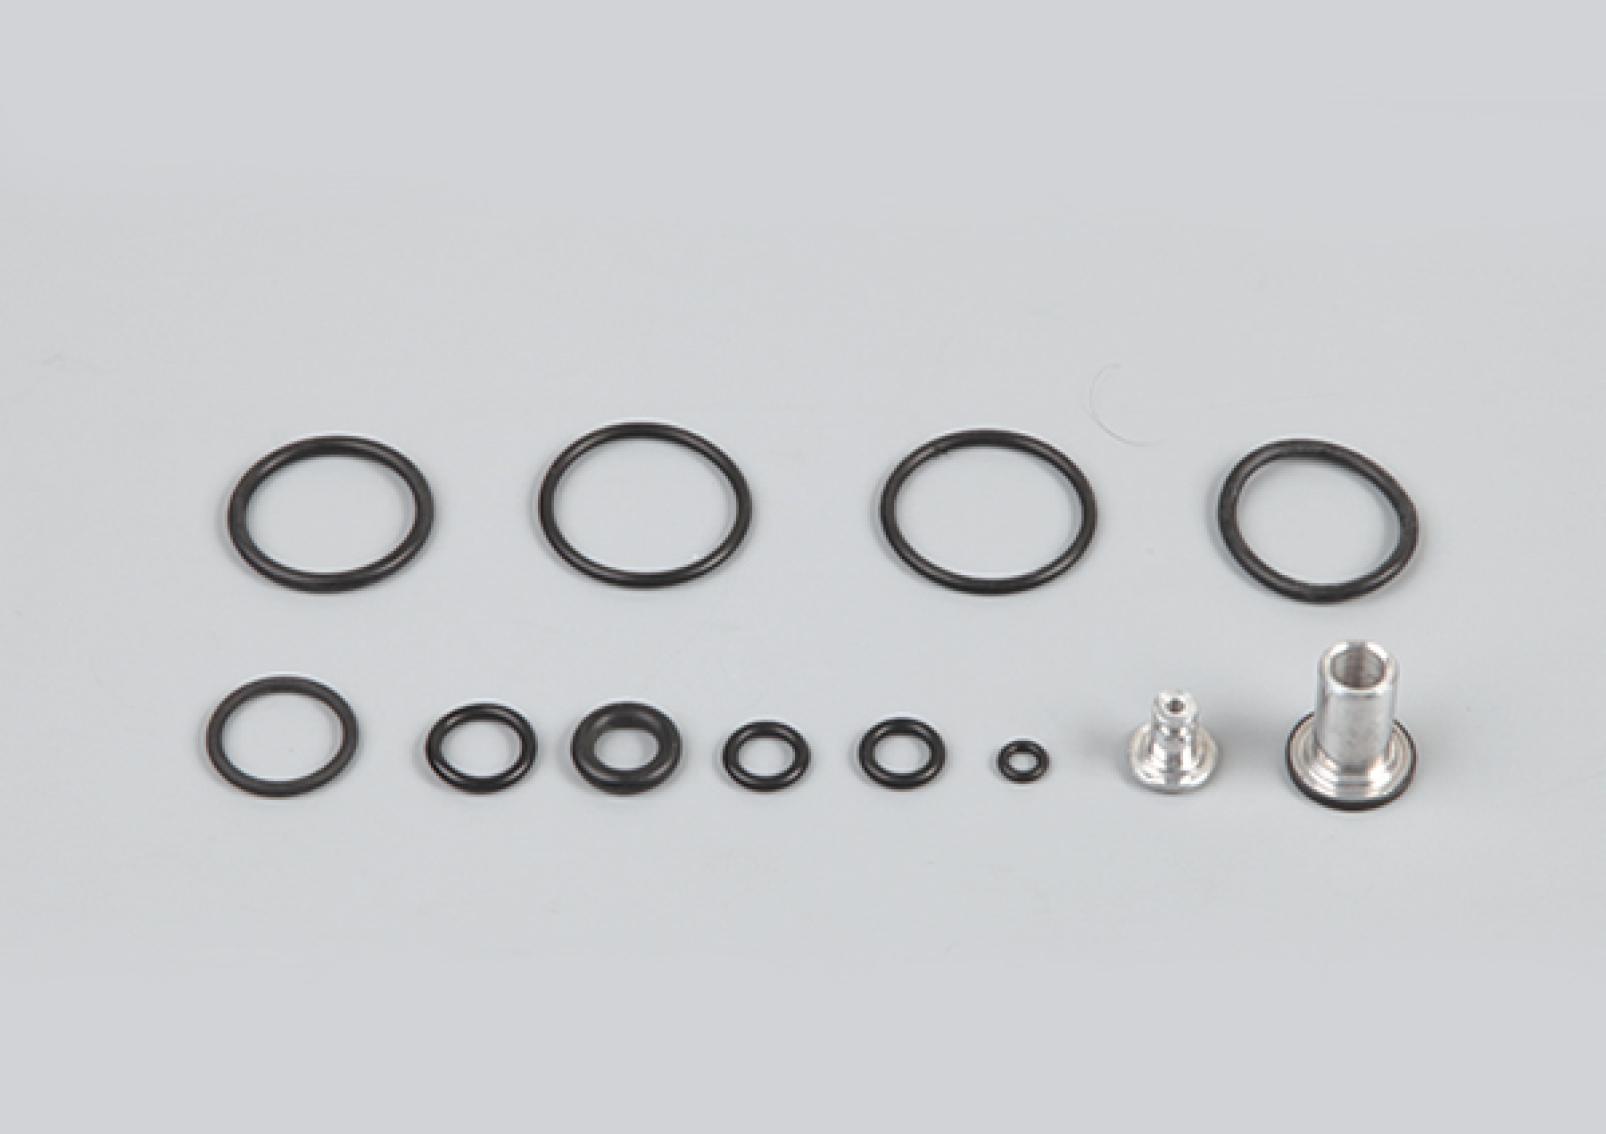 Hand Brake Valve Repair Kit, 1 487 010 297